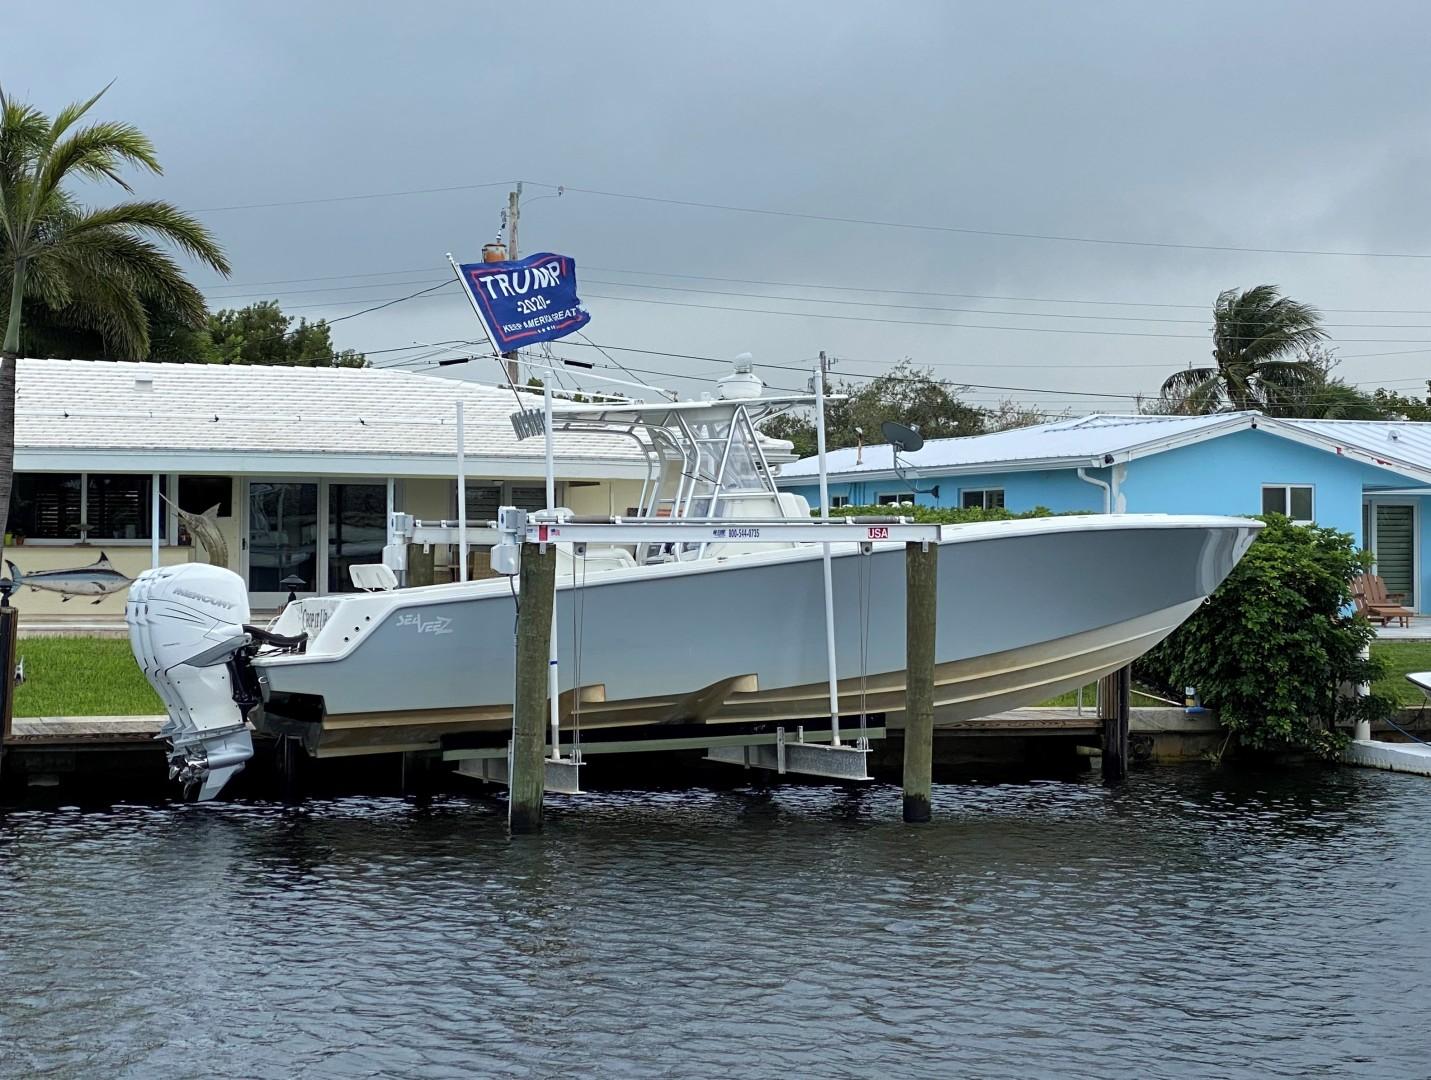 SeaVee-340Z 2018-Chop It Up Pompano Beach-Florida-United States-1548107   Thumbnail